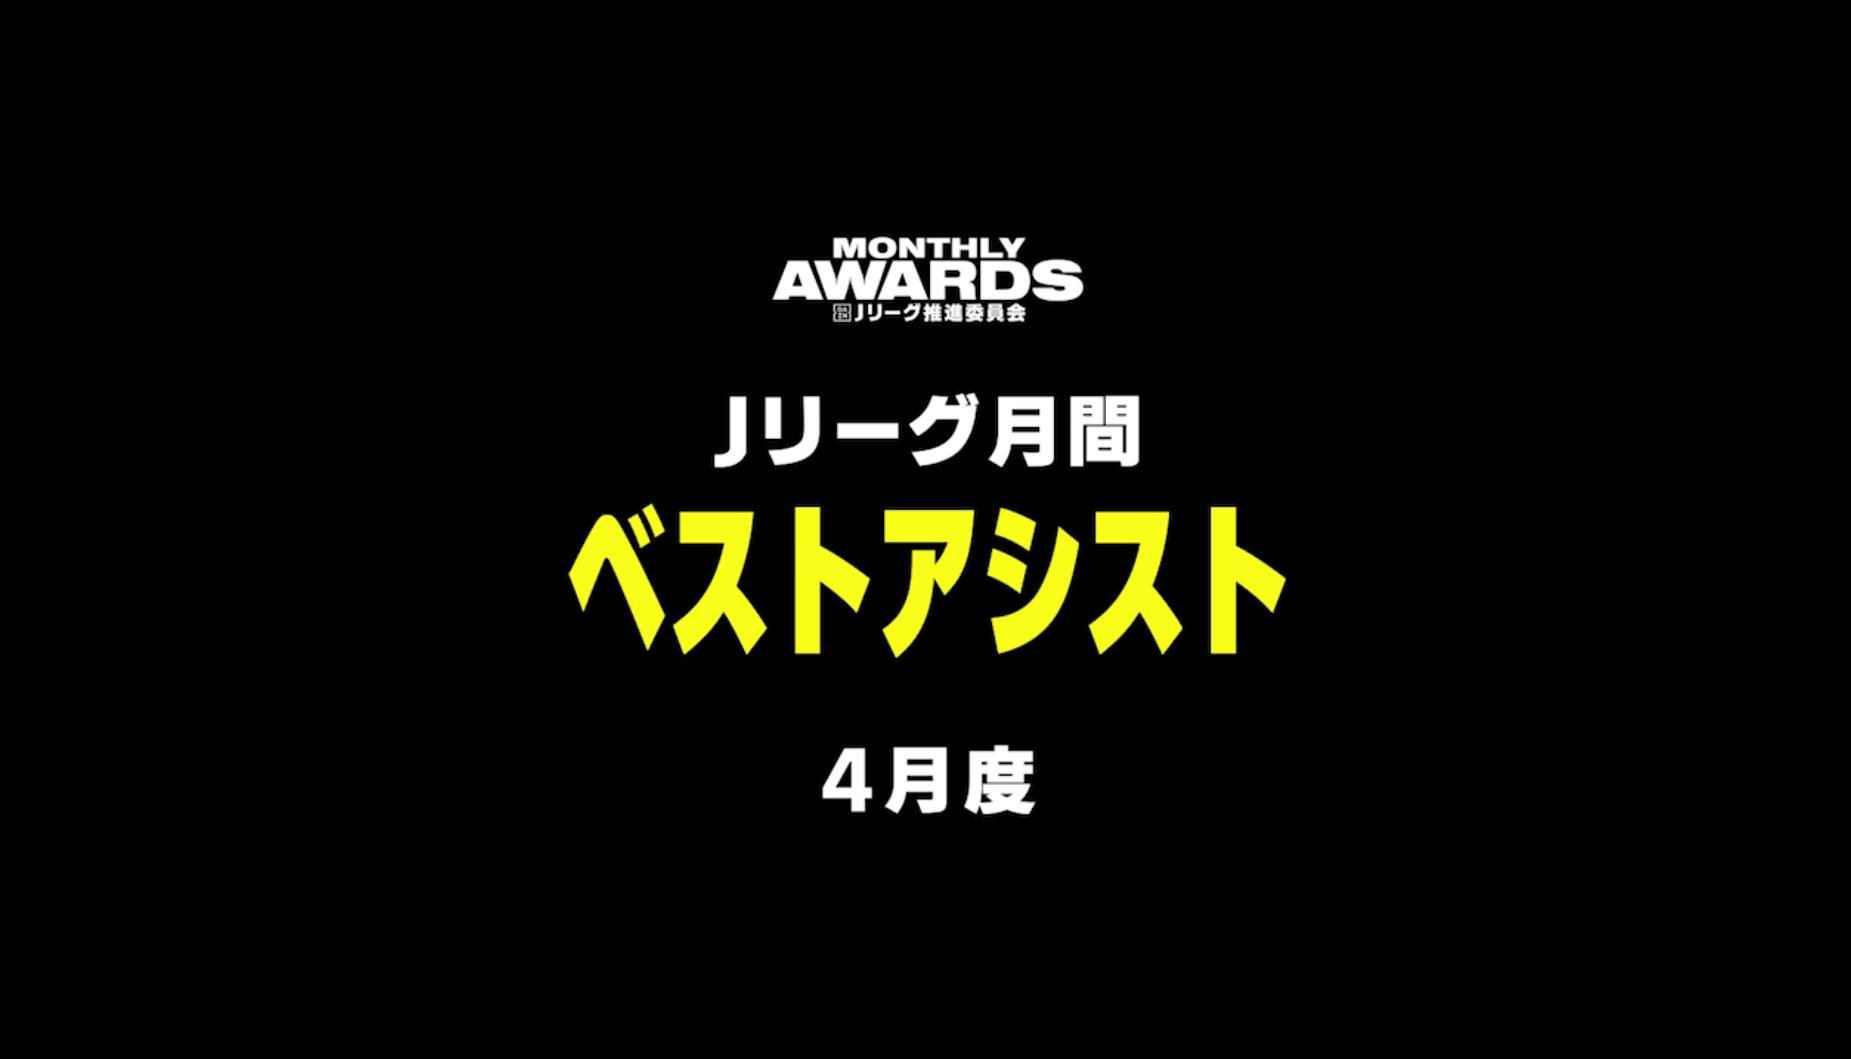 Jリーグ月間ベストアシスト 4月度 - 横浜FM 天野純(第10節札幌戦)